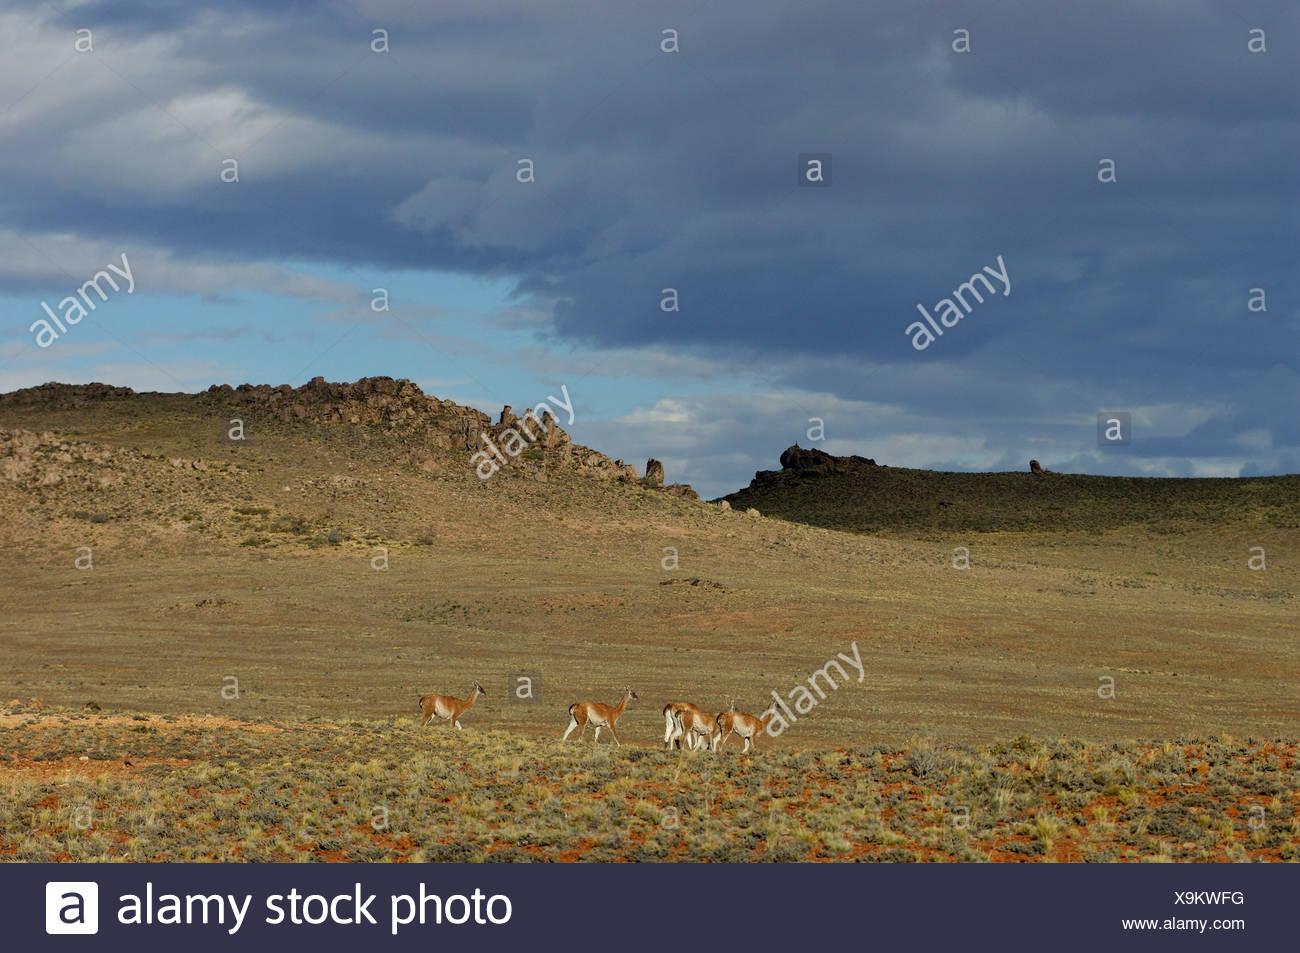 Guanaco Lama guanicoe near Estancia la Maria Patagonia Argentina South America - Stock Image